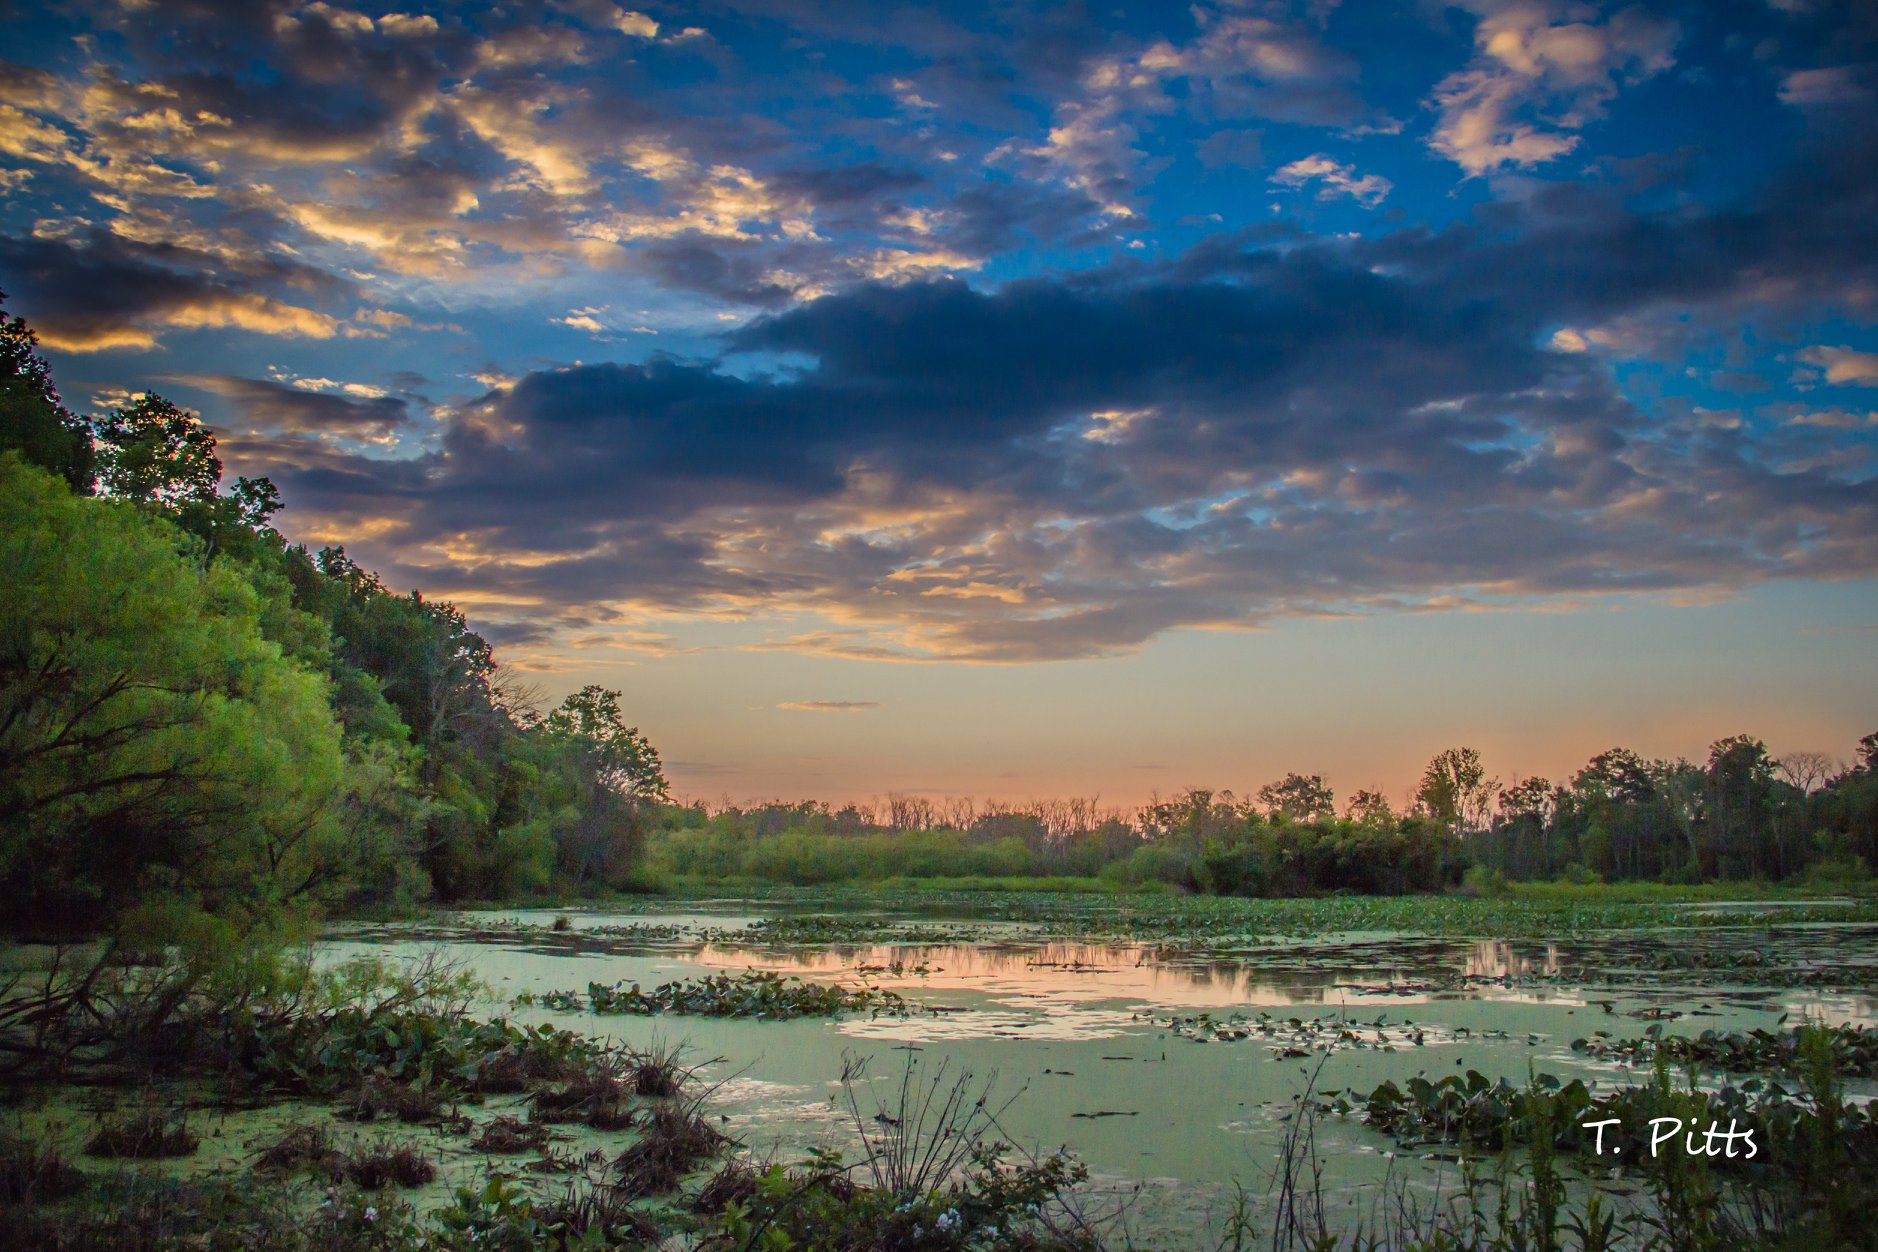 McKee Beshers, T. Pitts sunrise.jpg